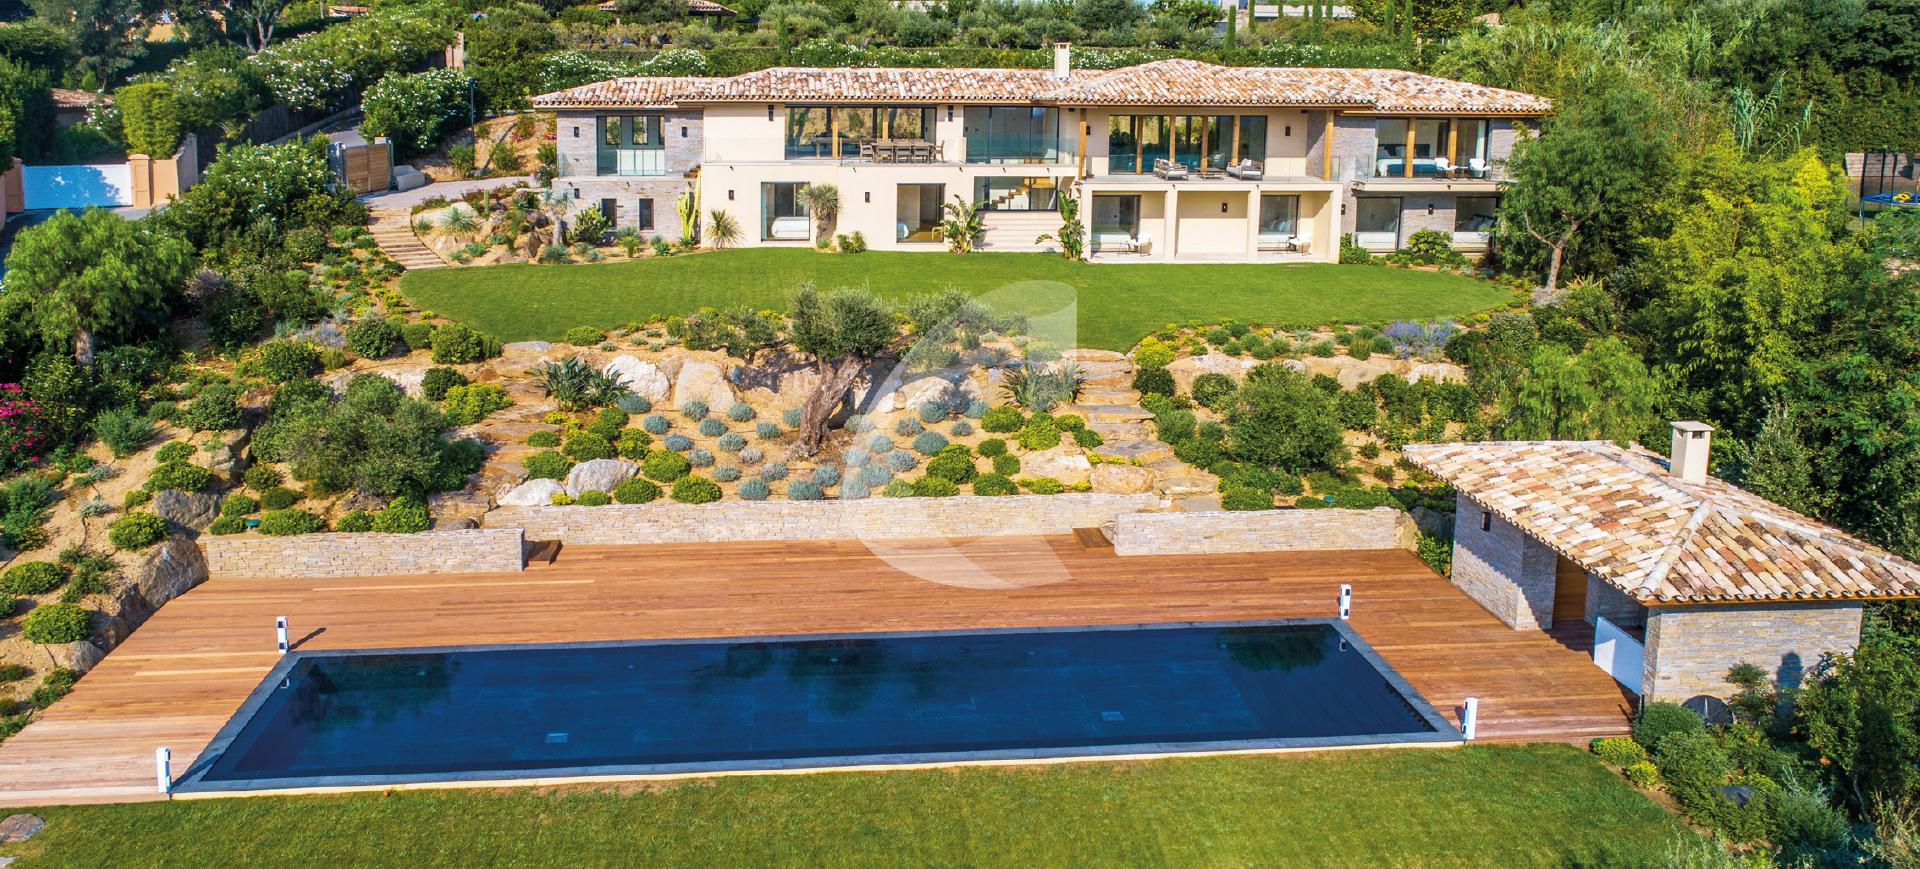 St Tropez rent villa beautiful view